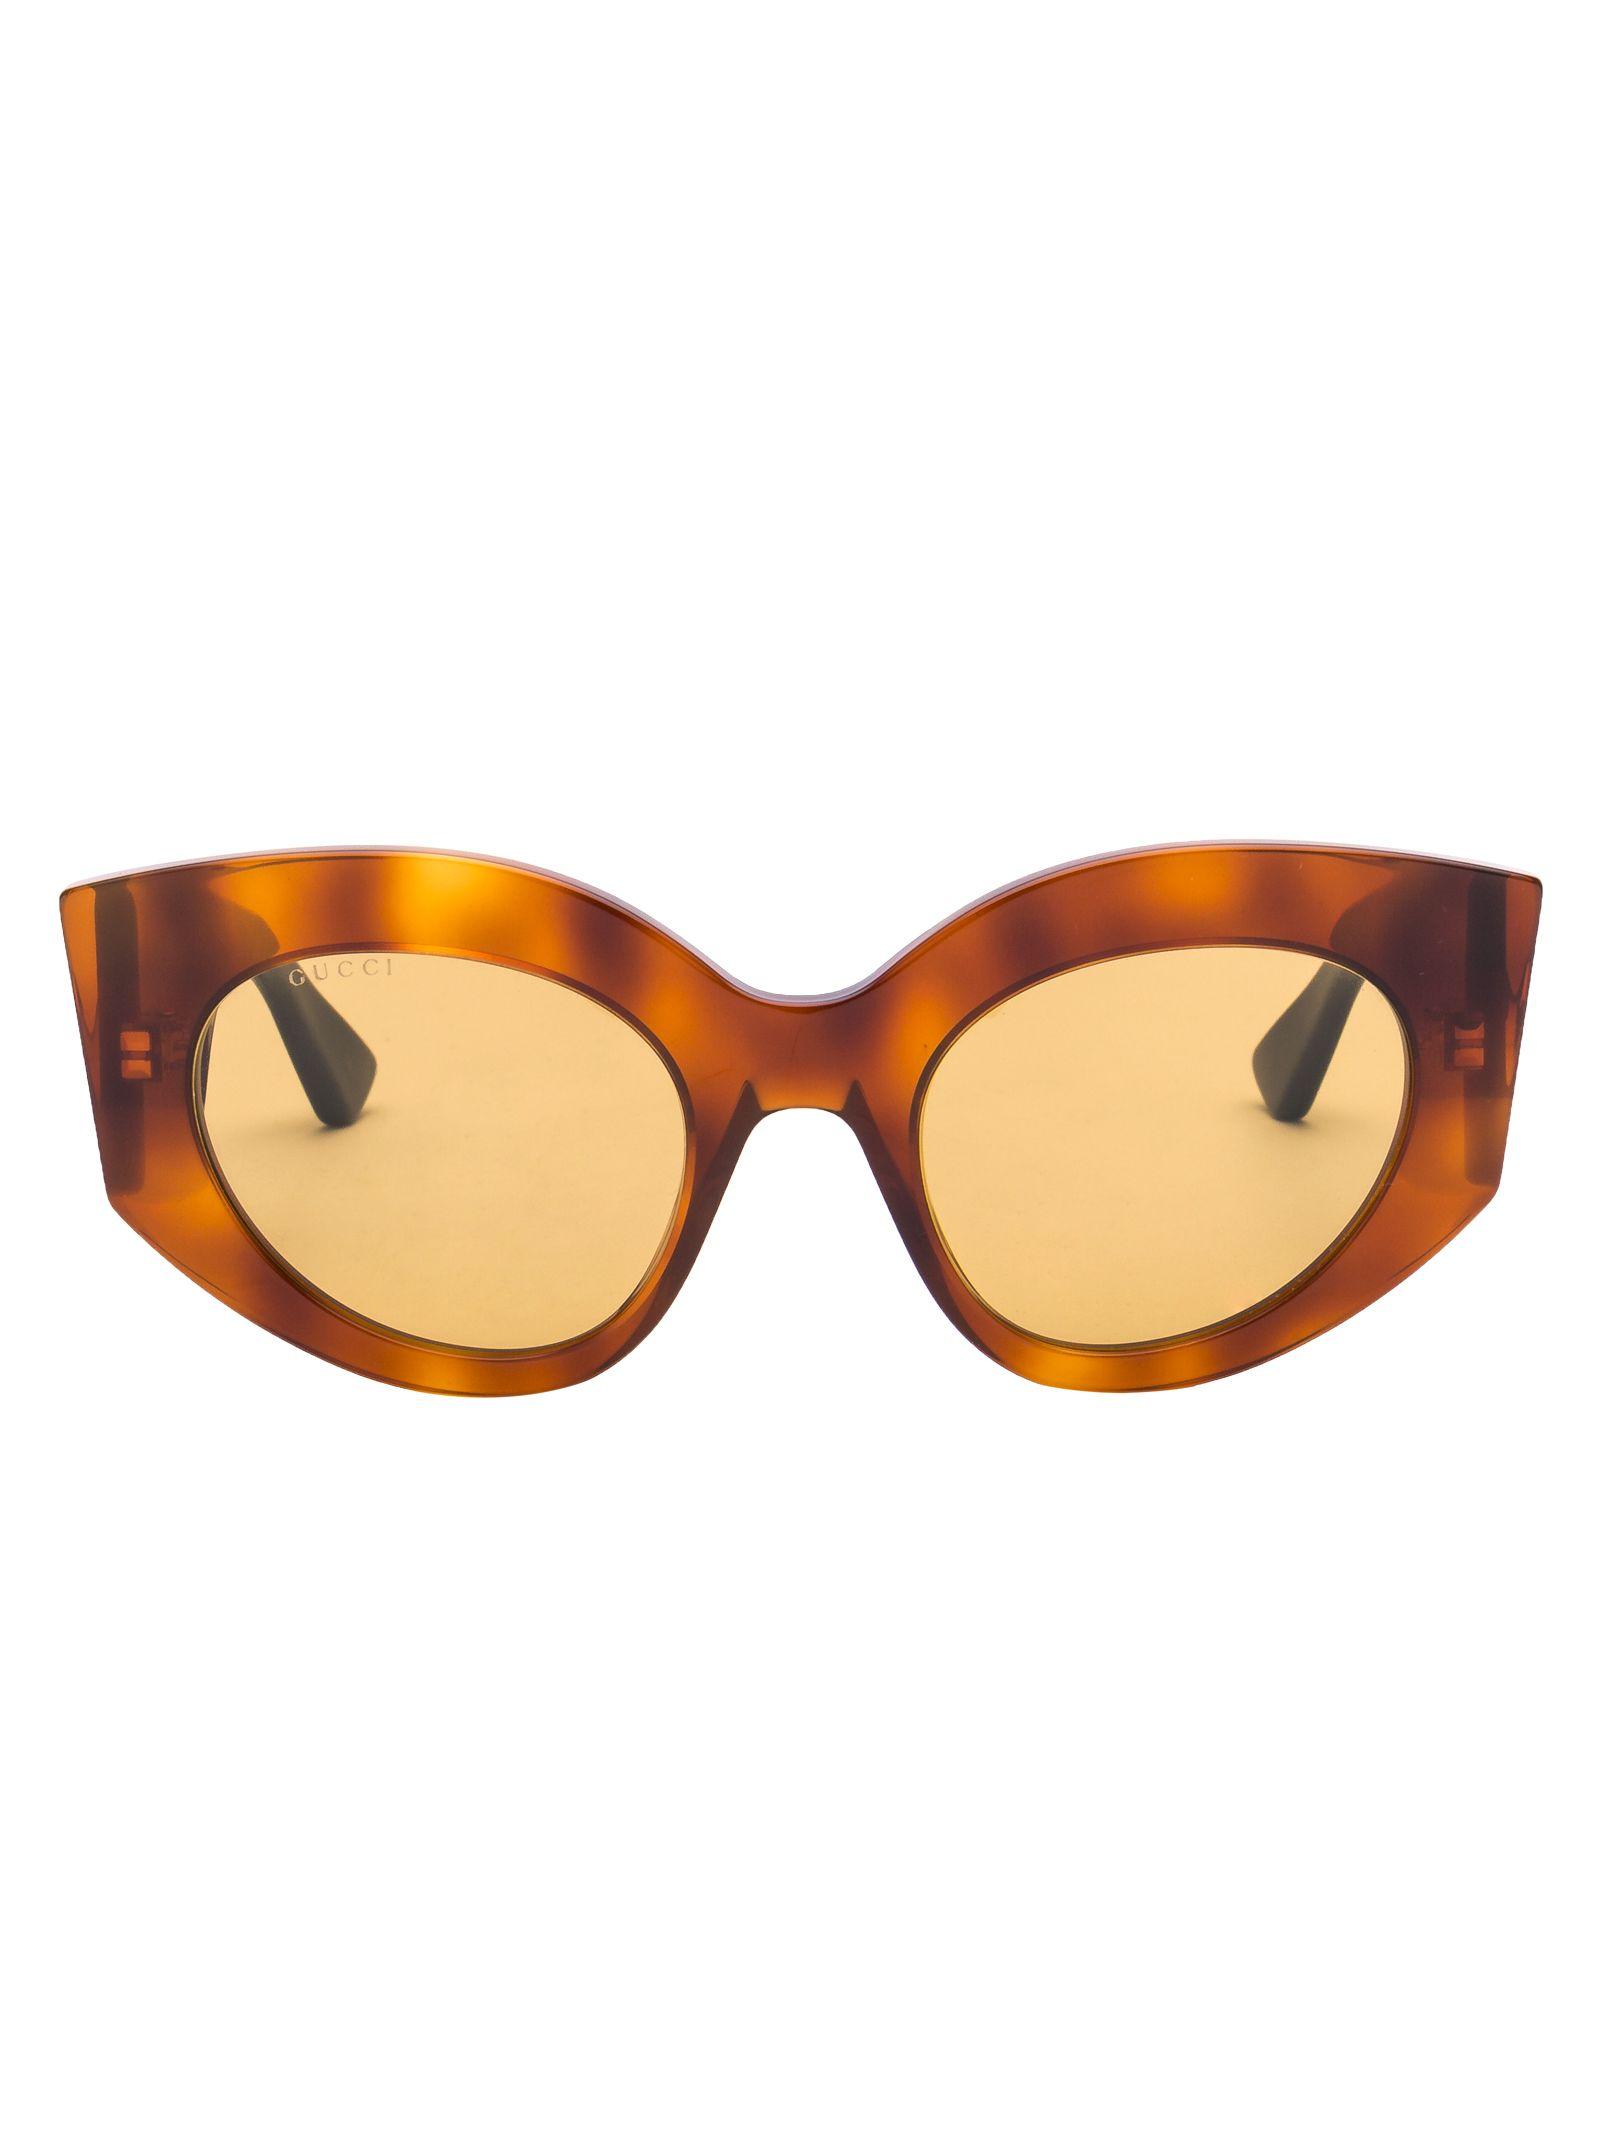 Gucci Eyewear Oversized Cat Eye Sunglasses